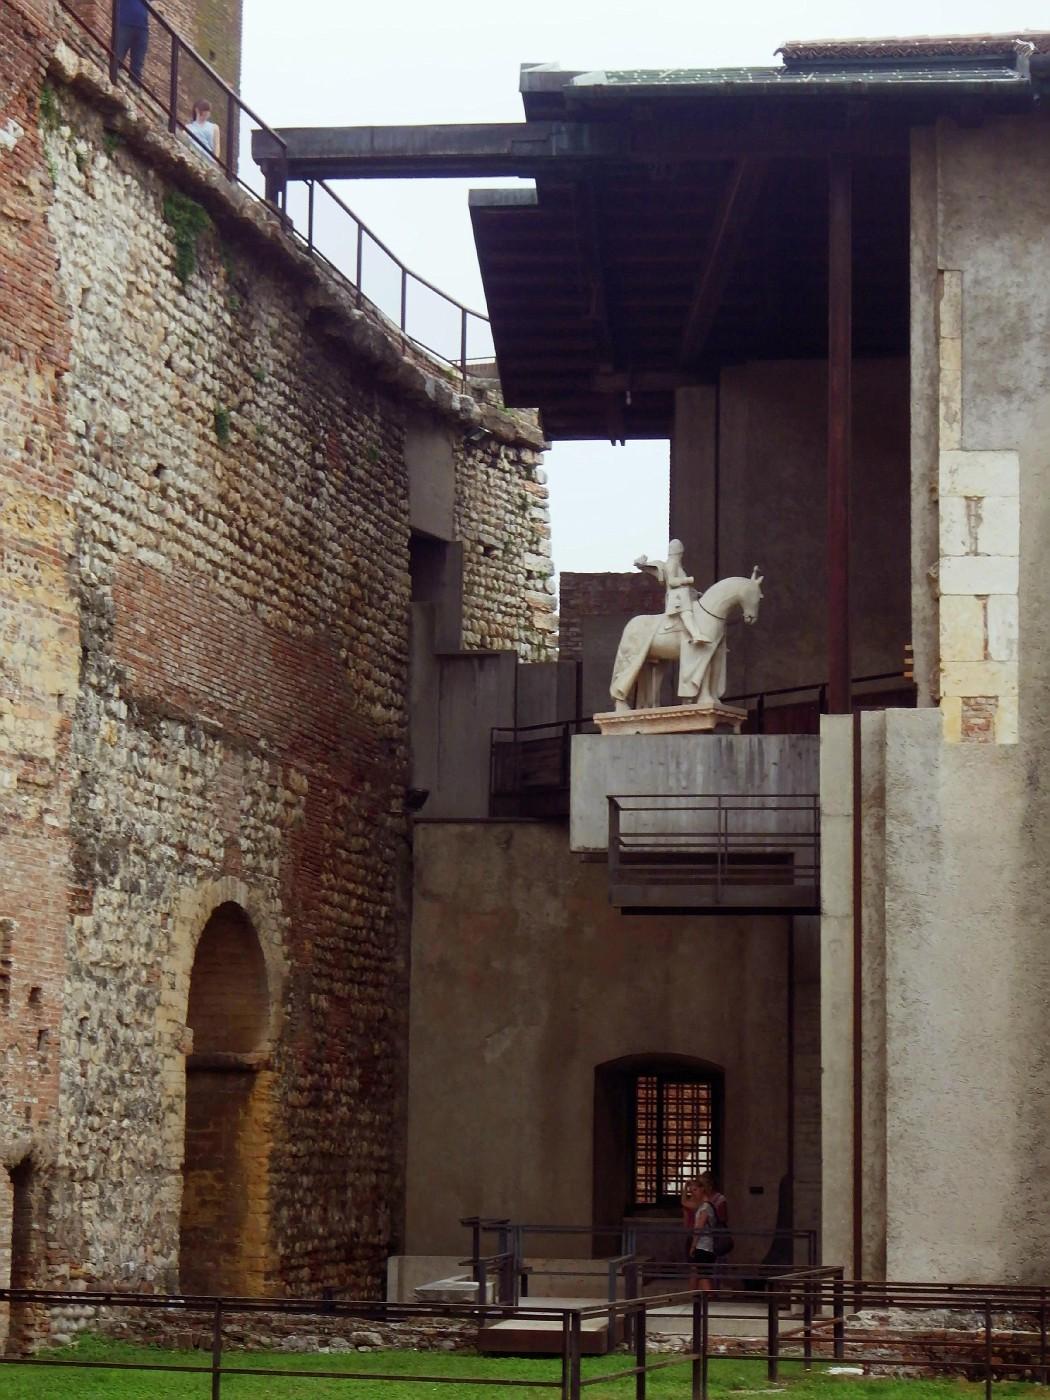 Castel Vecchio, statue of Cangrande